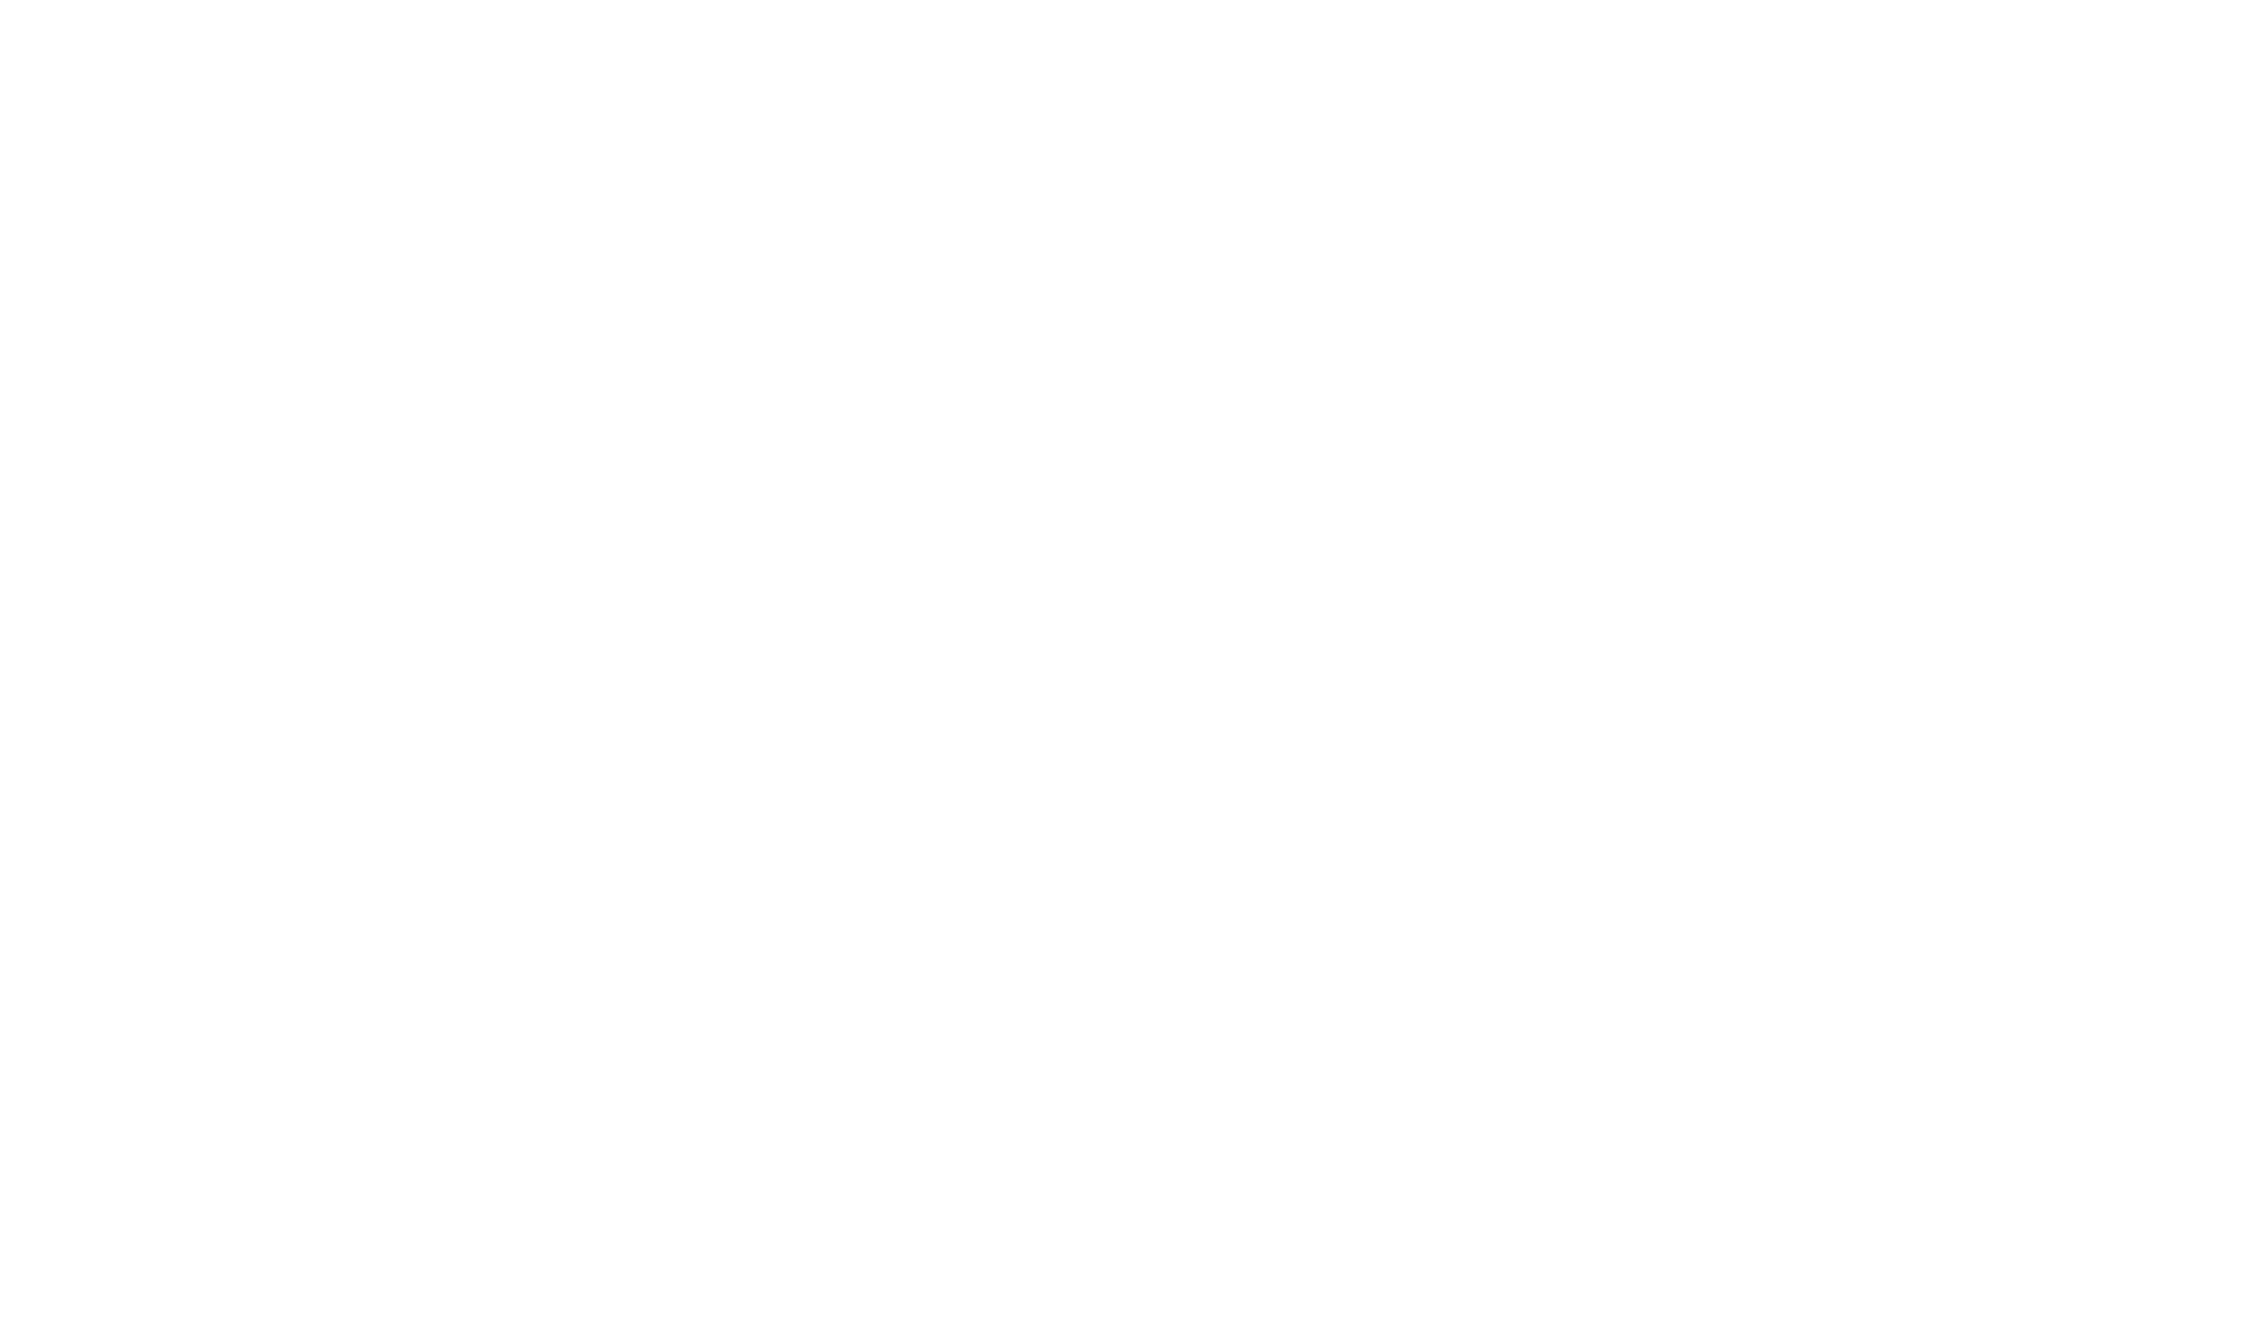 AmFam_Castle_INC_closer_ALL white copy